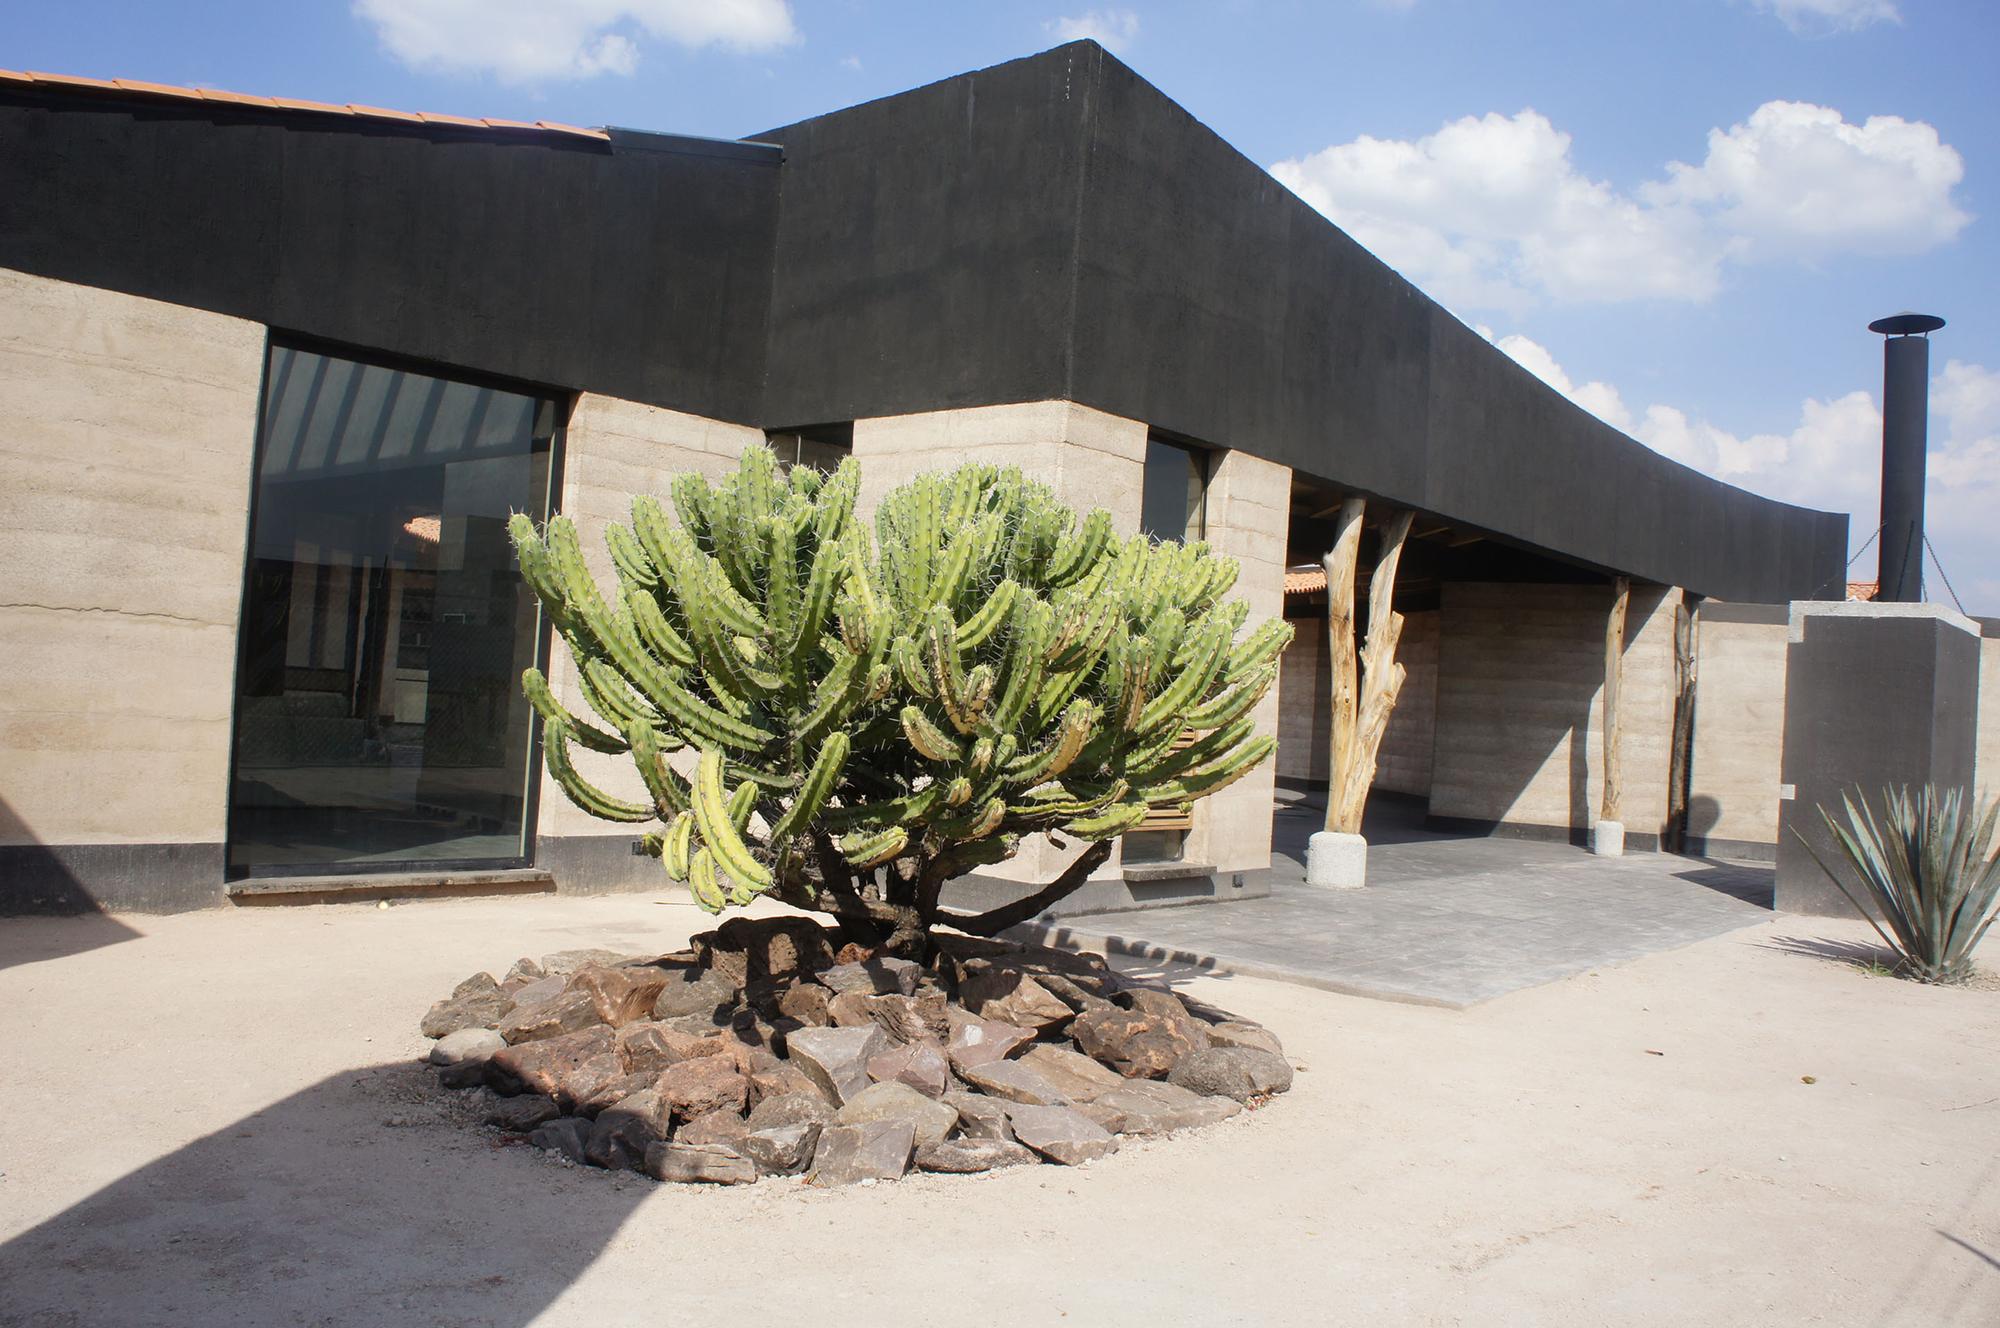 Studio House Sabinos / Juan Carlos Loyo Arquitectura, © Juan Carlos Loyo